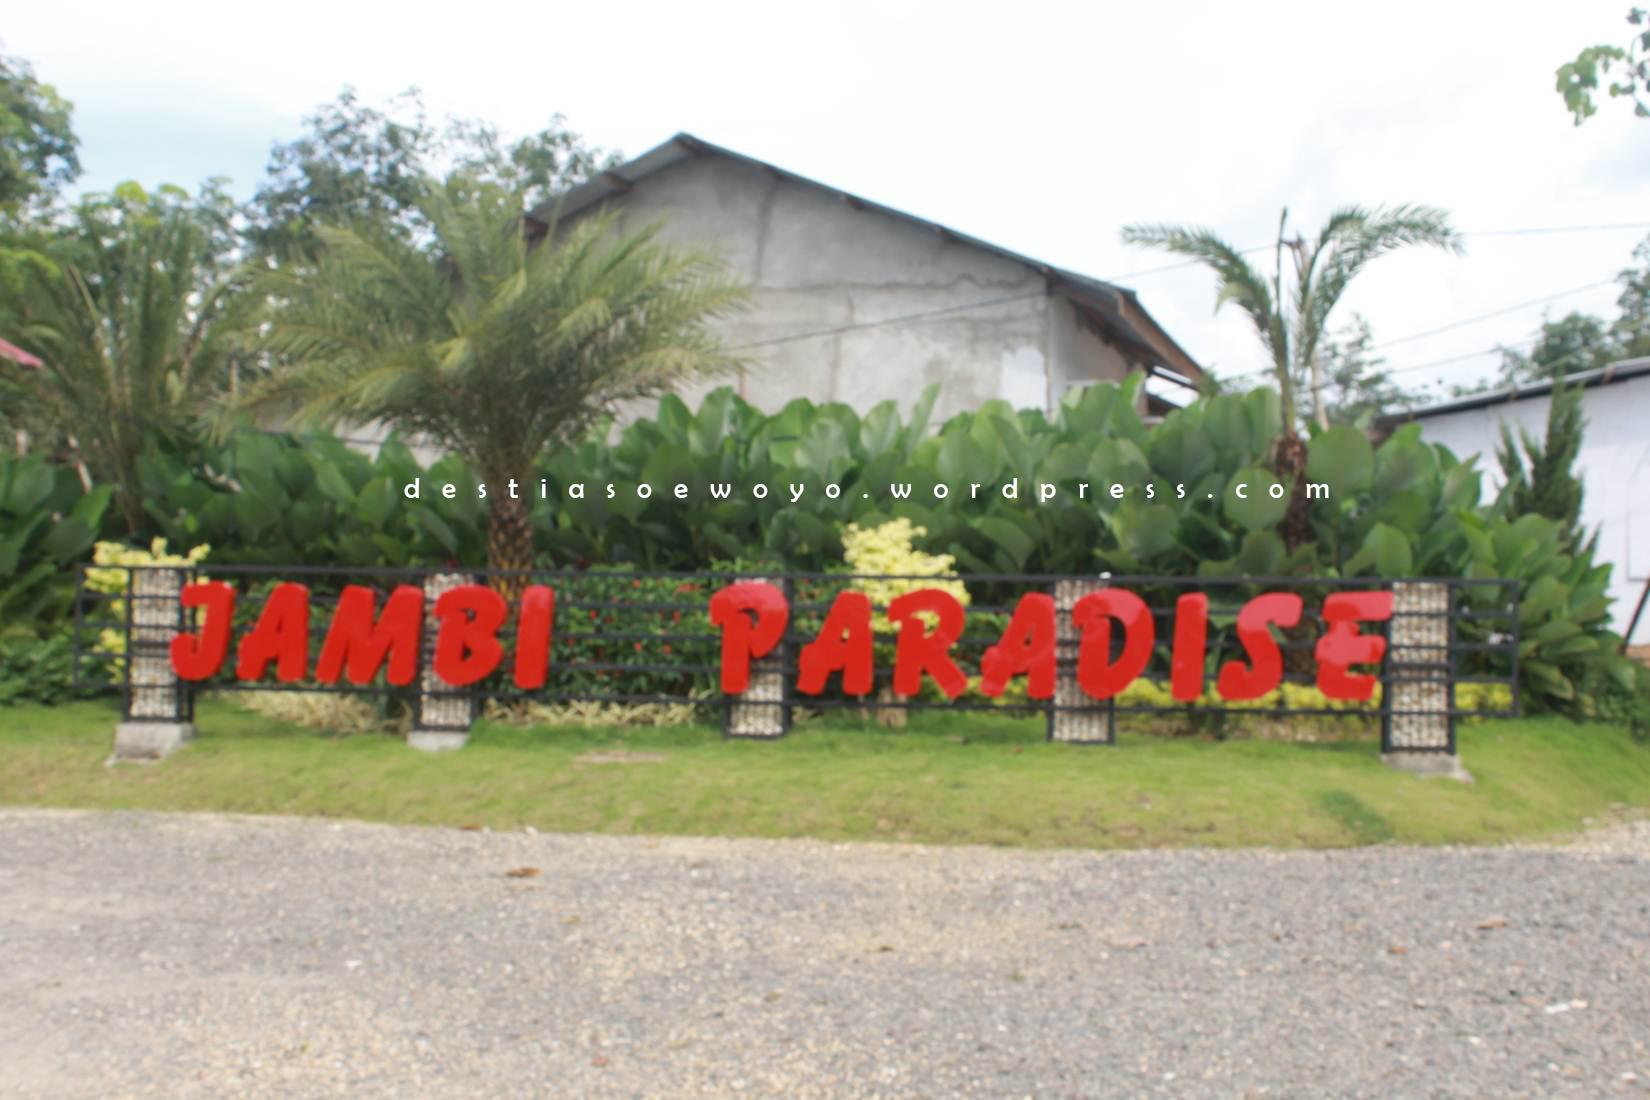 Jambi Paradise Wisata Taman Explore Architecturediary Entrance Depan Kota